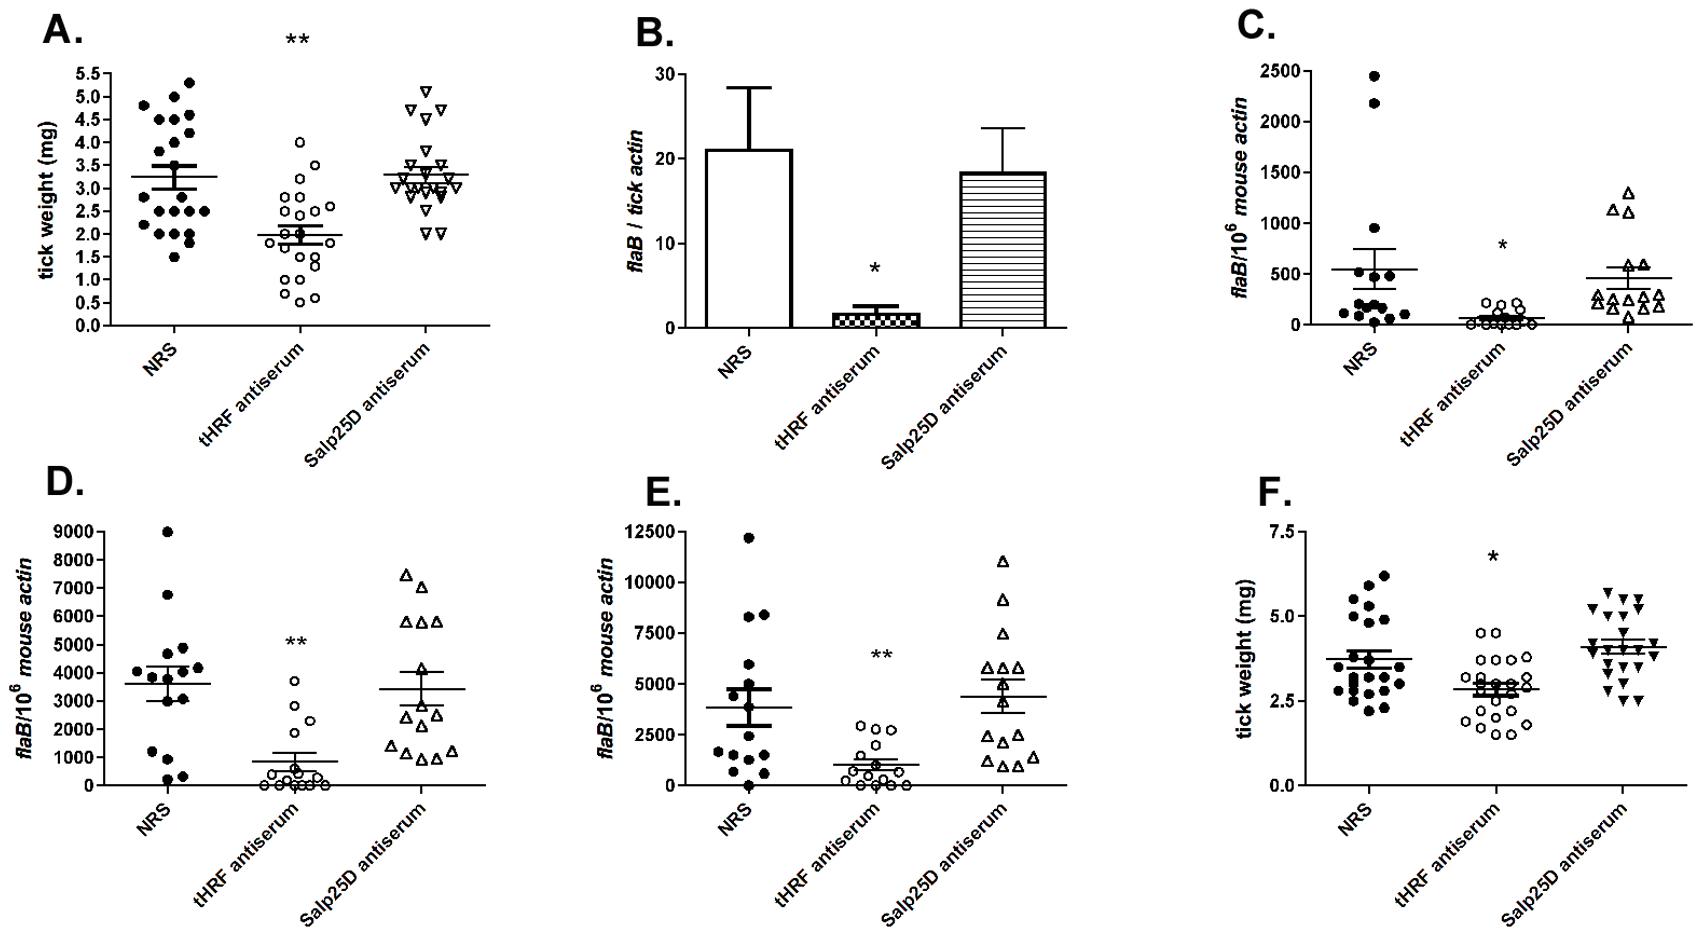 tHRF antiserum interferes with tick feeding and <i>B. burgdorferi</i> transmission.